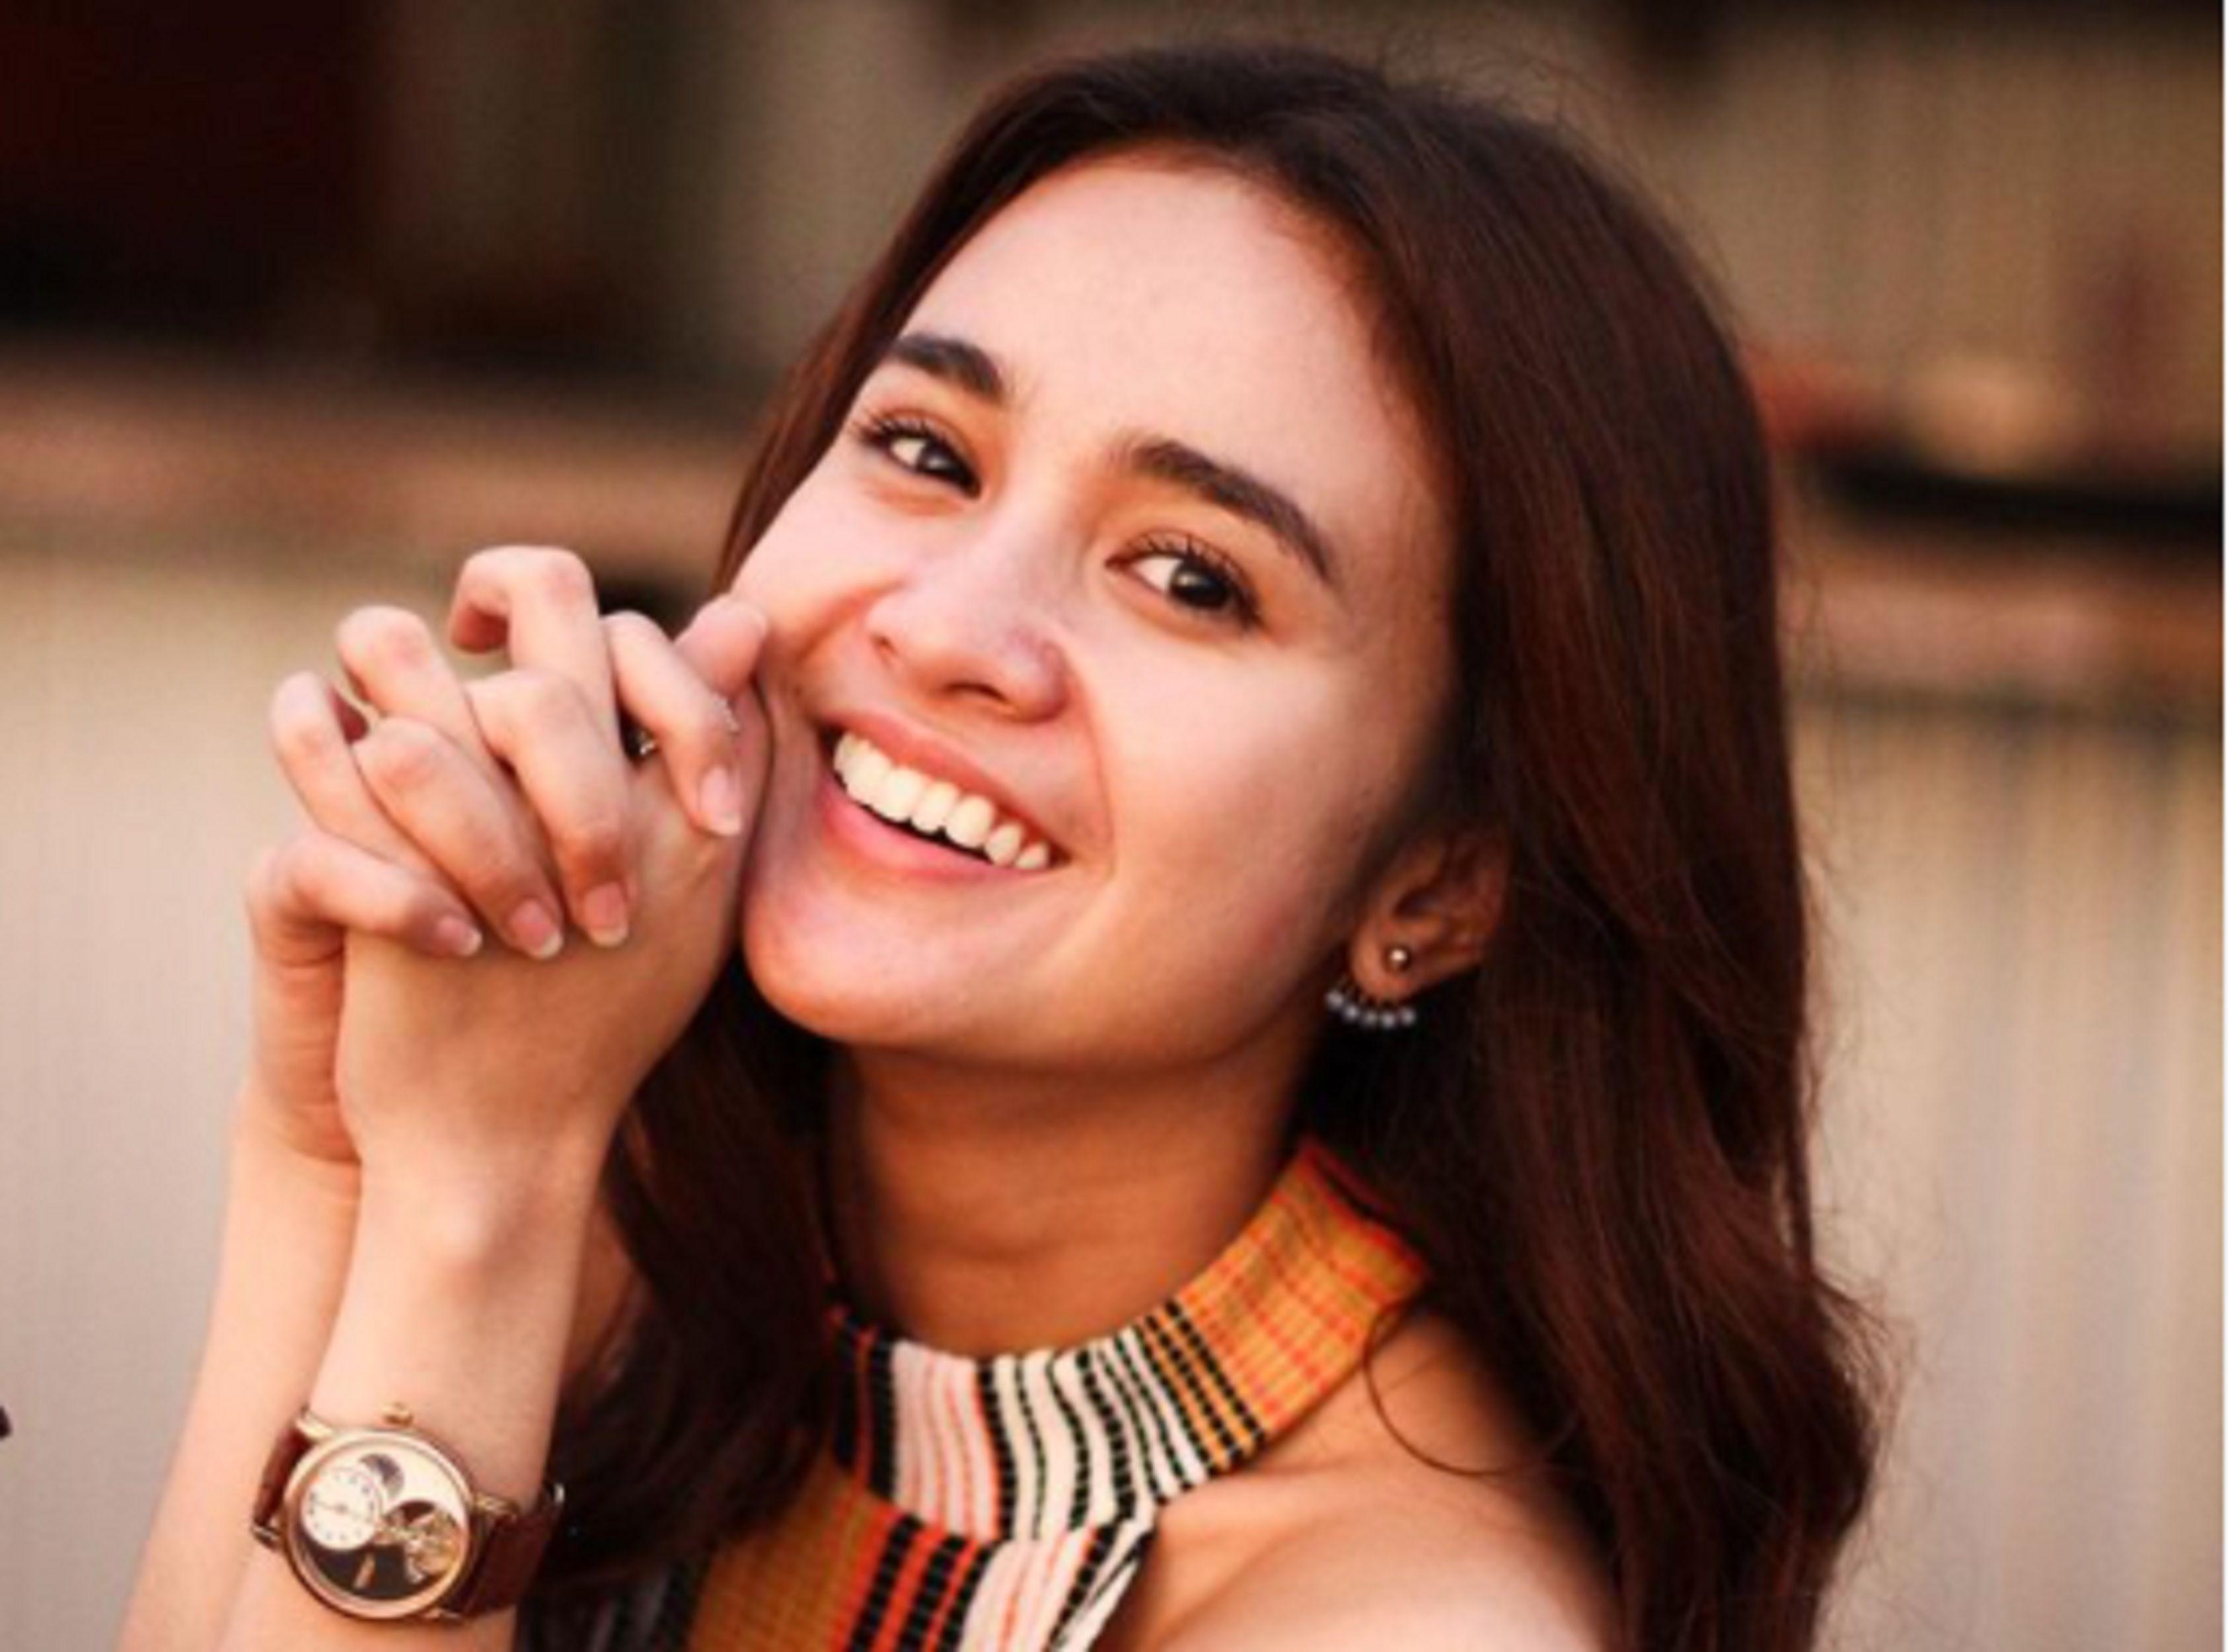 Profil Michelle Ziudith Pemeran Sinetron Cinta Mulia Artis Cantik Dan Hobi Menari Portal Bangka Belitung